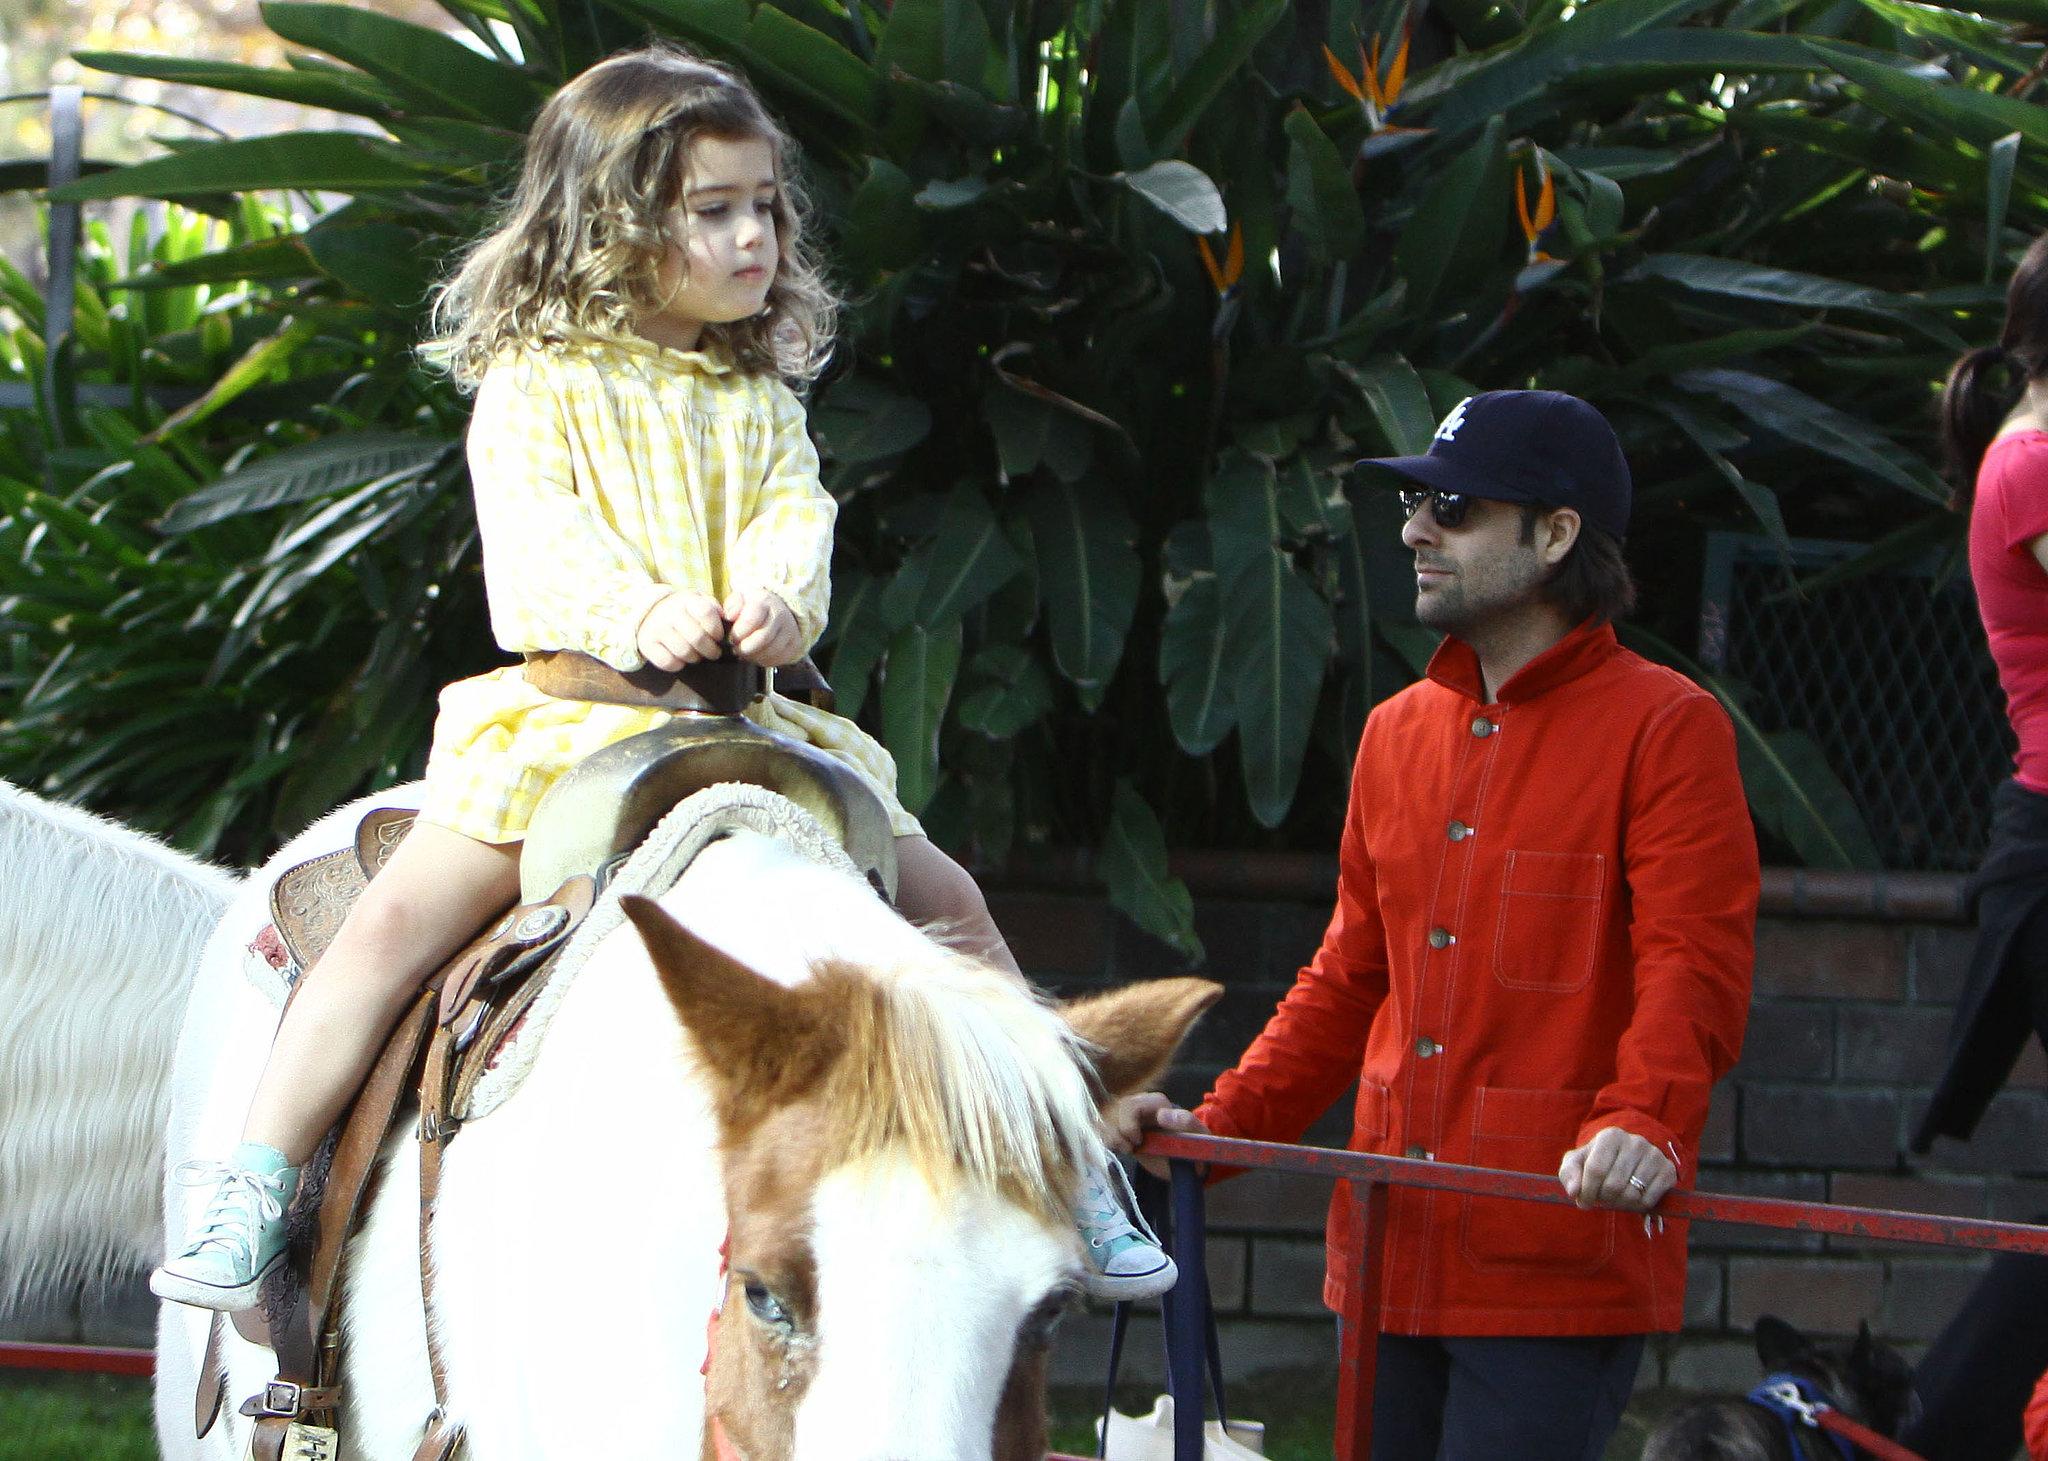 Jason Schwartzman watched as his daughter, Marlowe, rode a ...